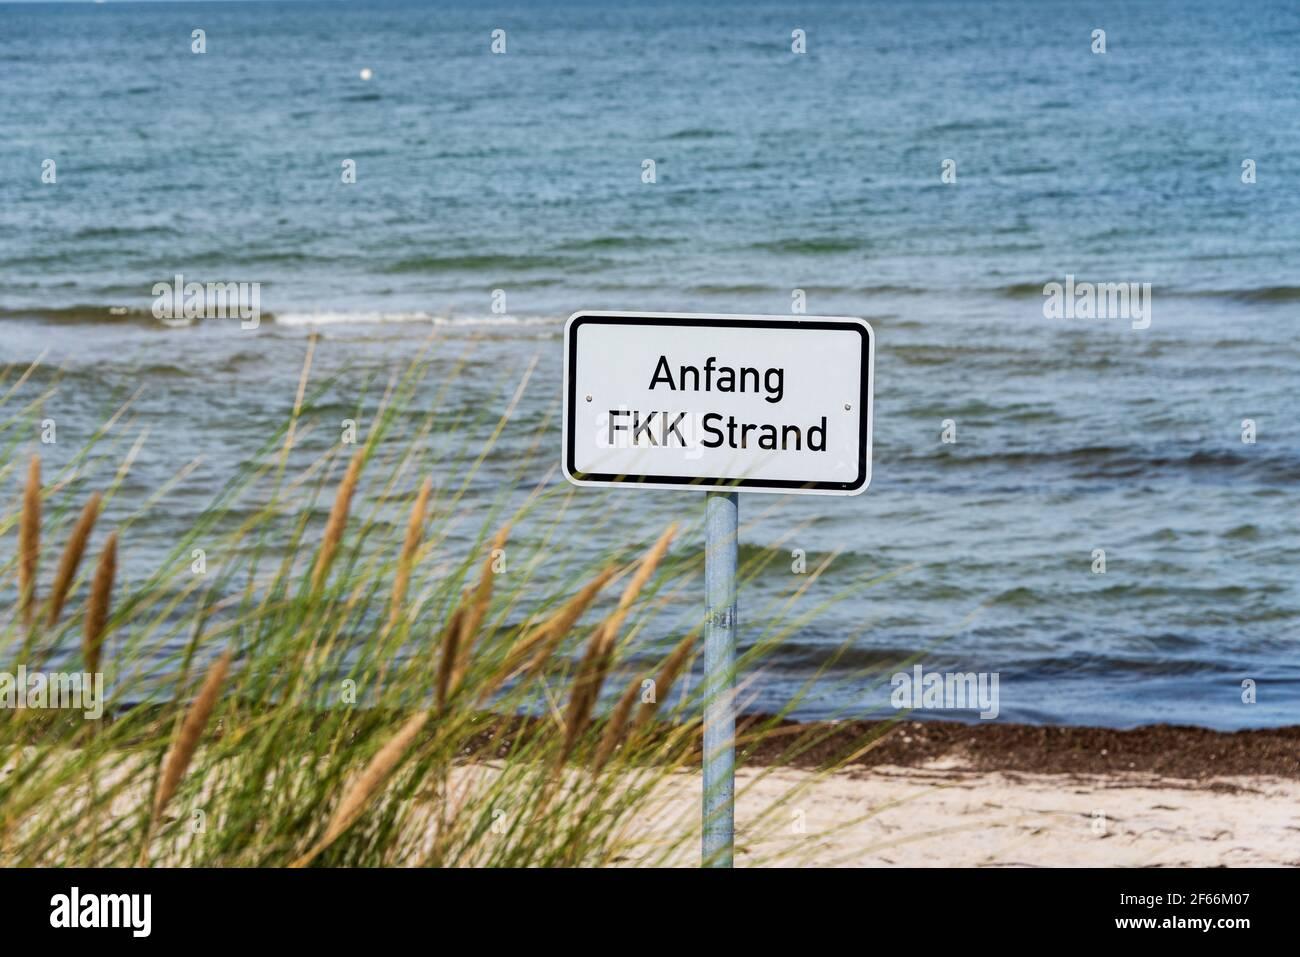 Hotel ostsee fkk FKK Urlaub